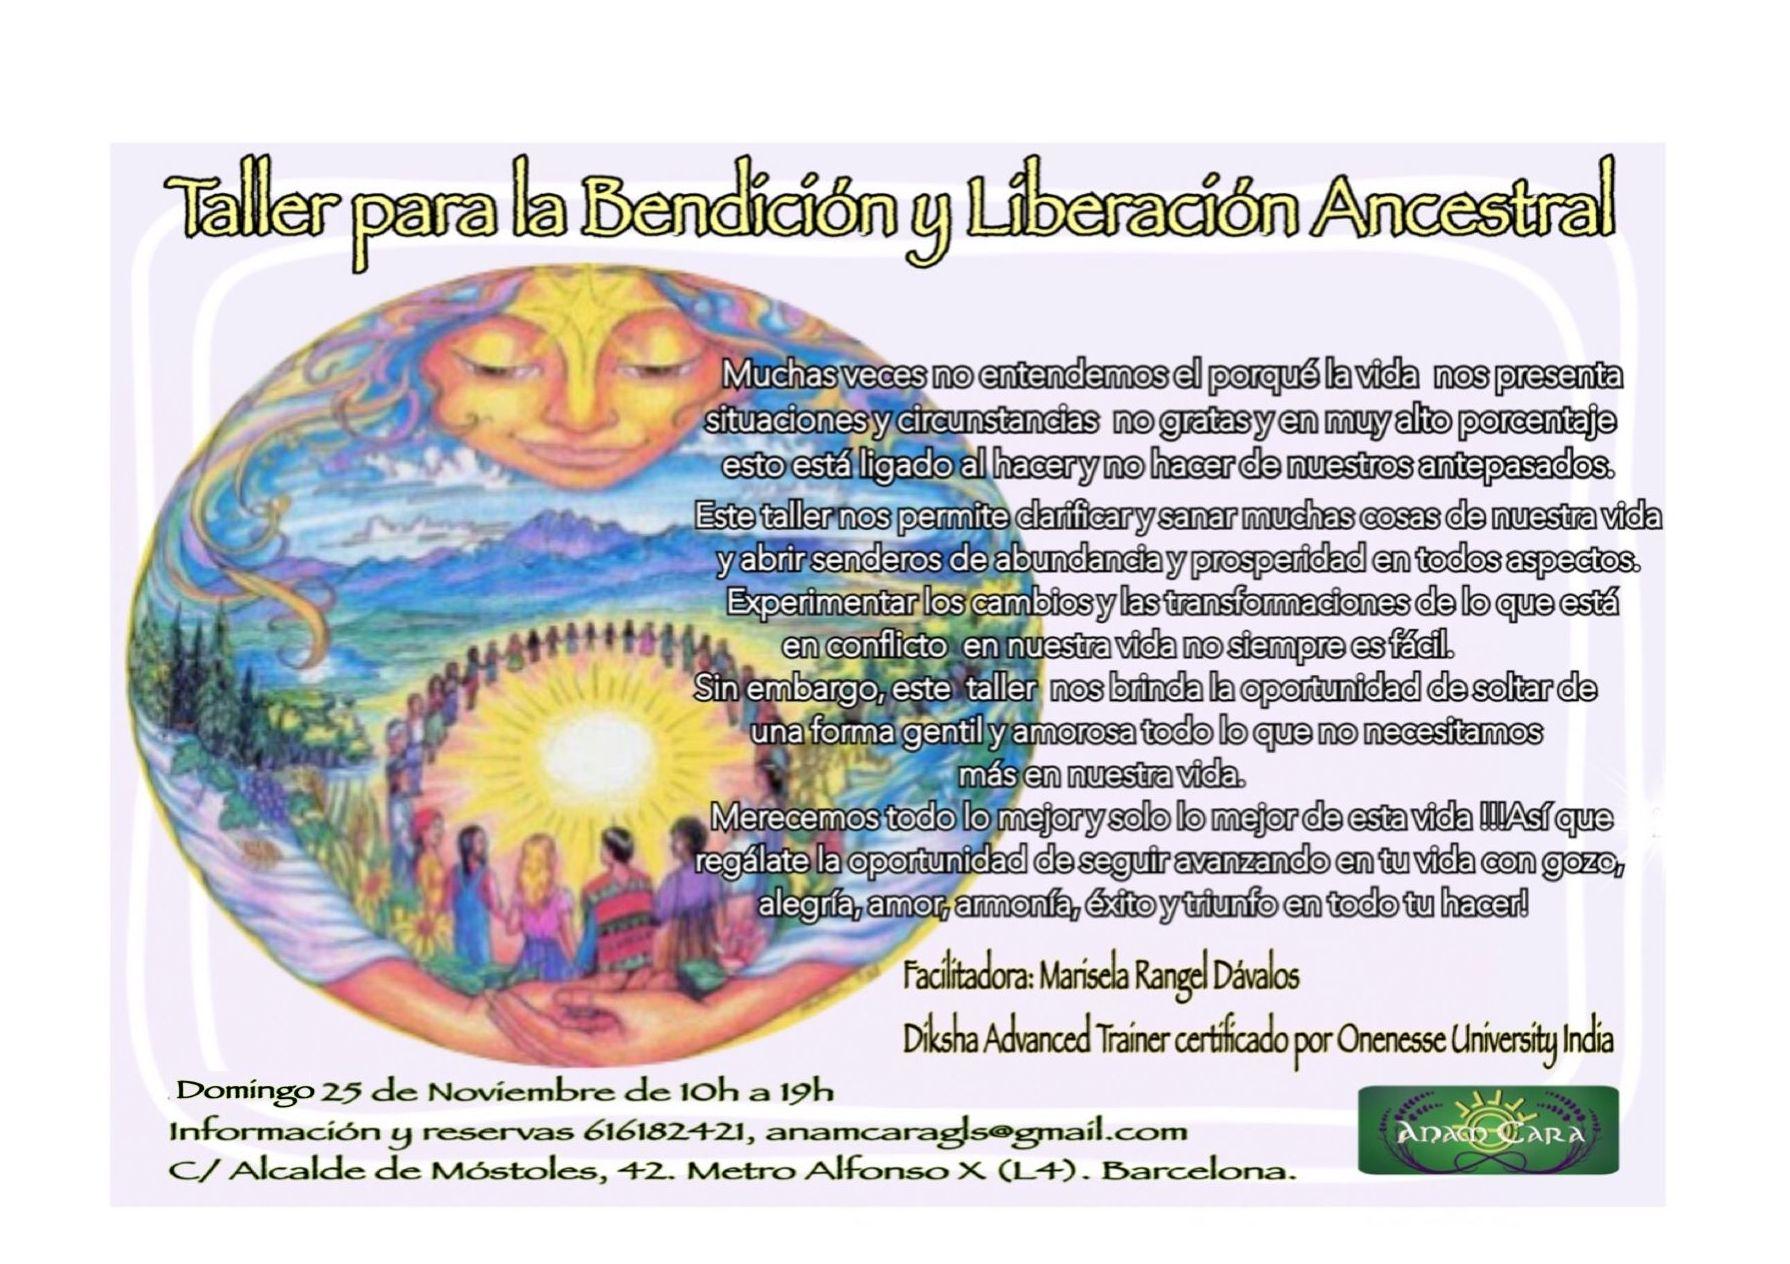 TALLER DE BENDICIÓN Y SANACION ANCESTRAL día 25 de noviembre de 10h a 19h